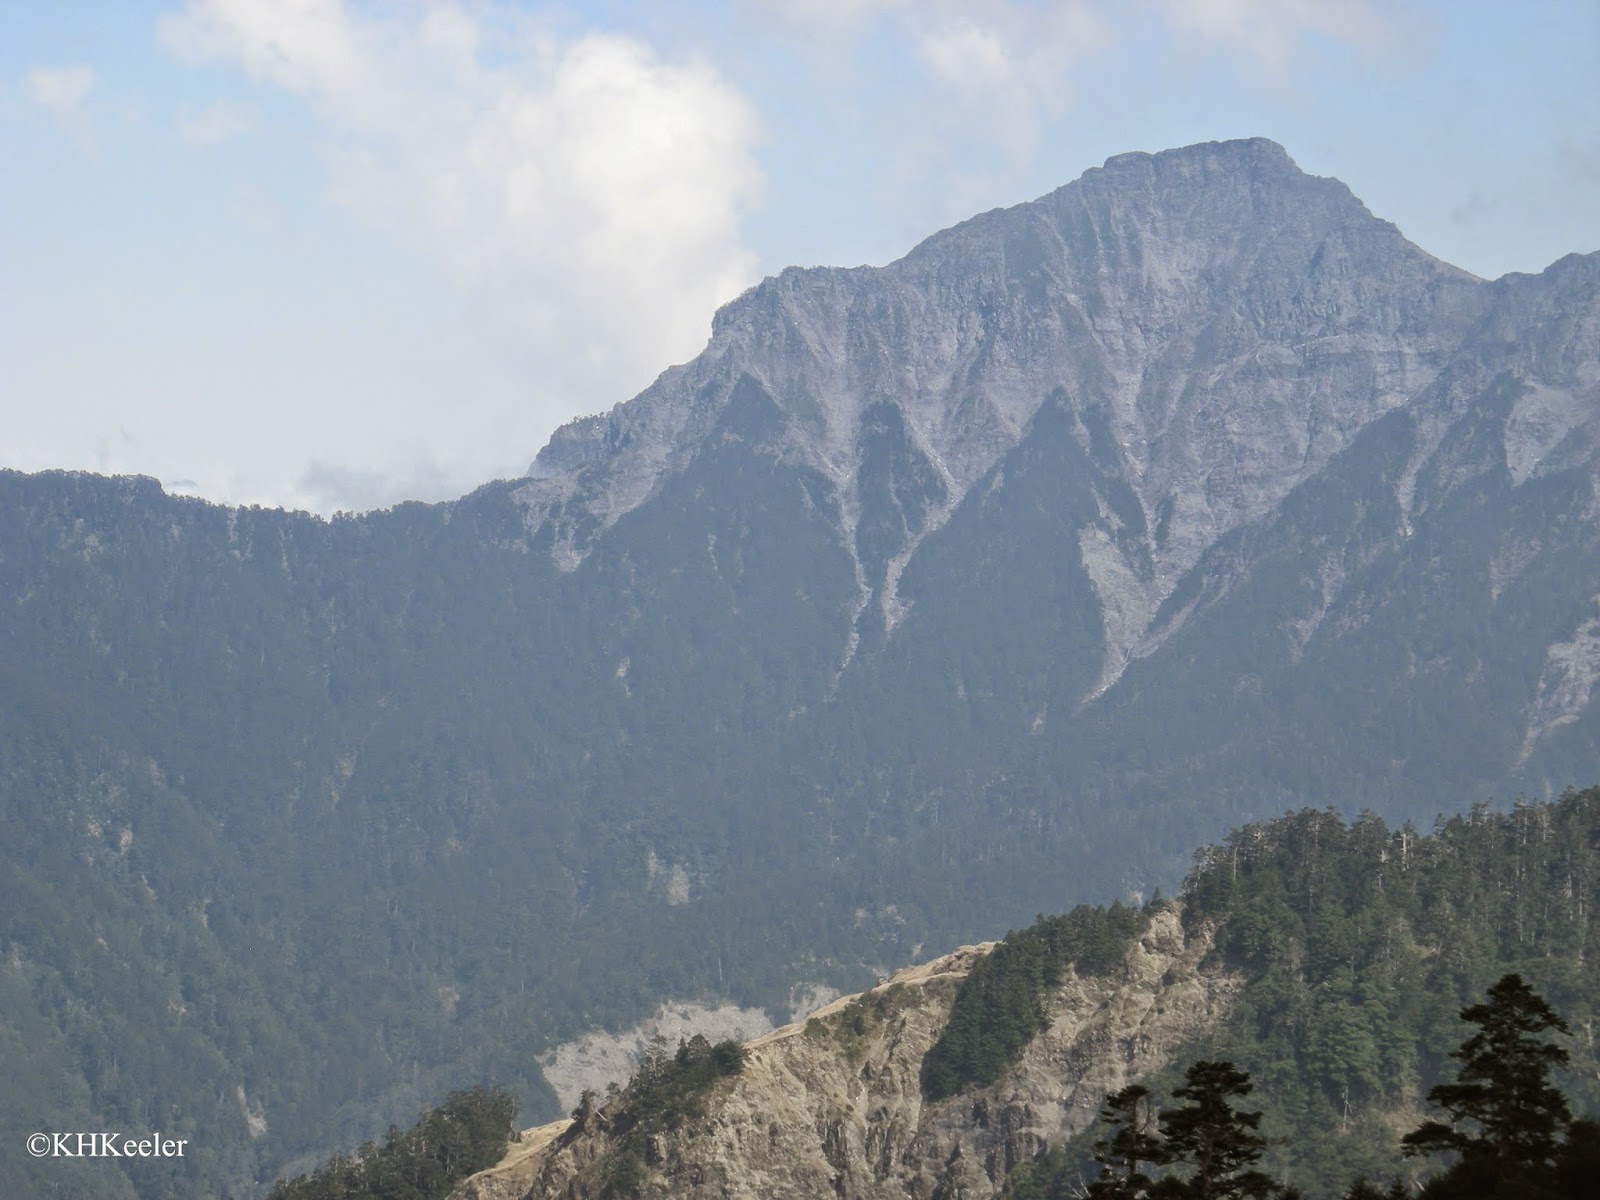 mountains of Taiwan